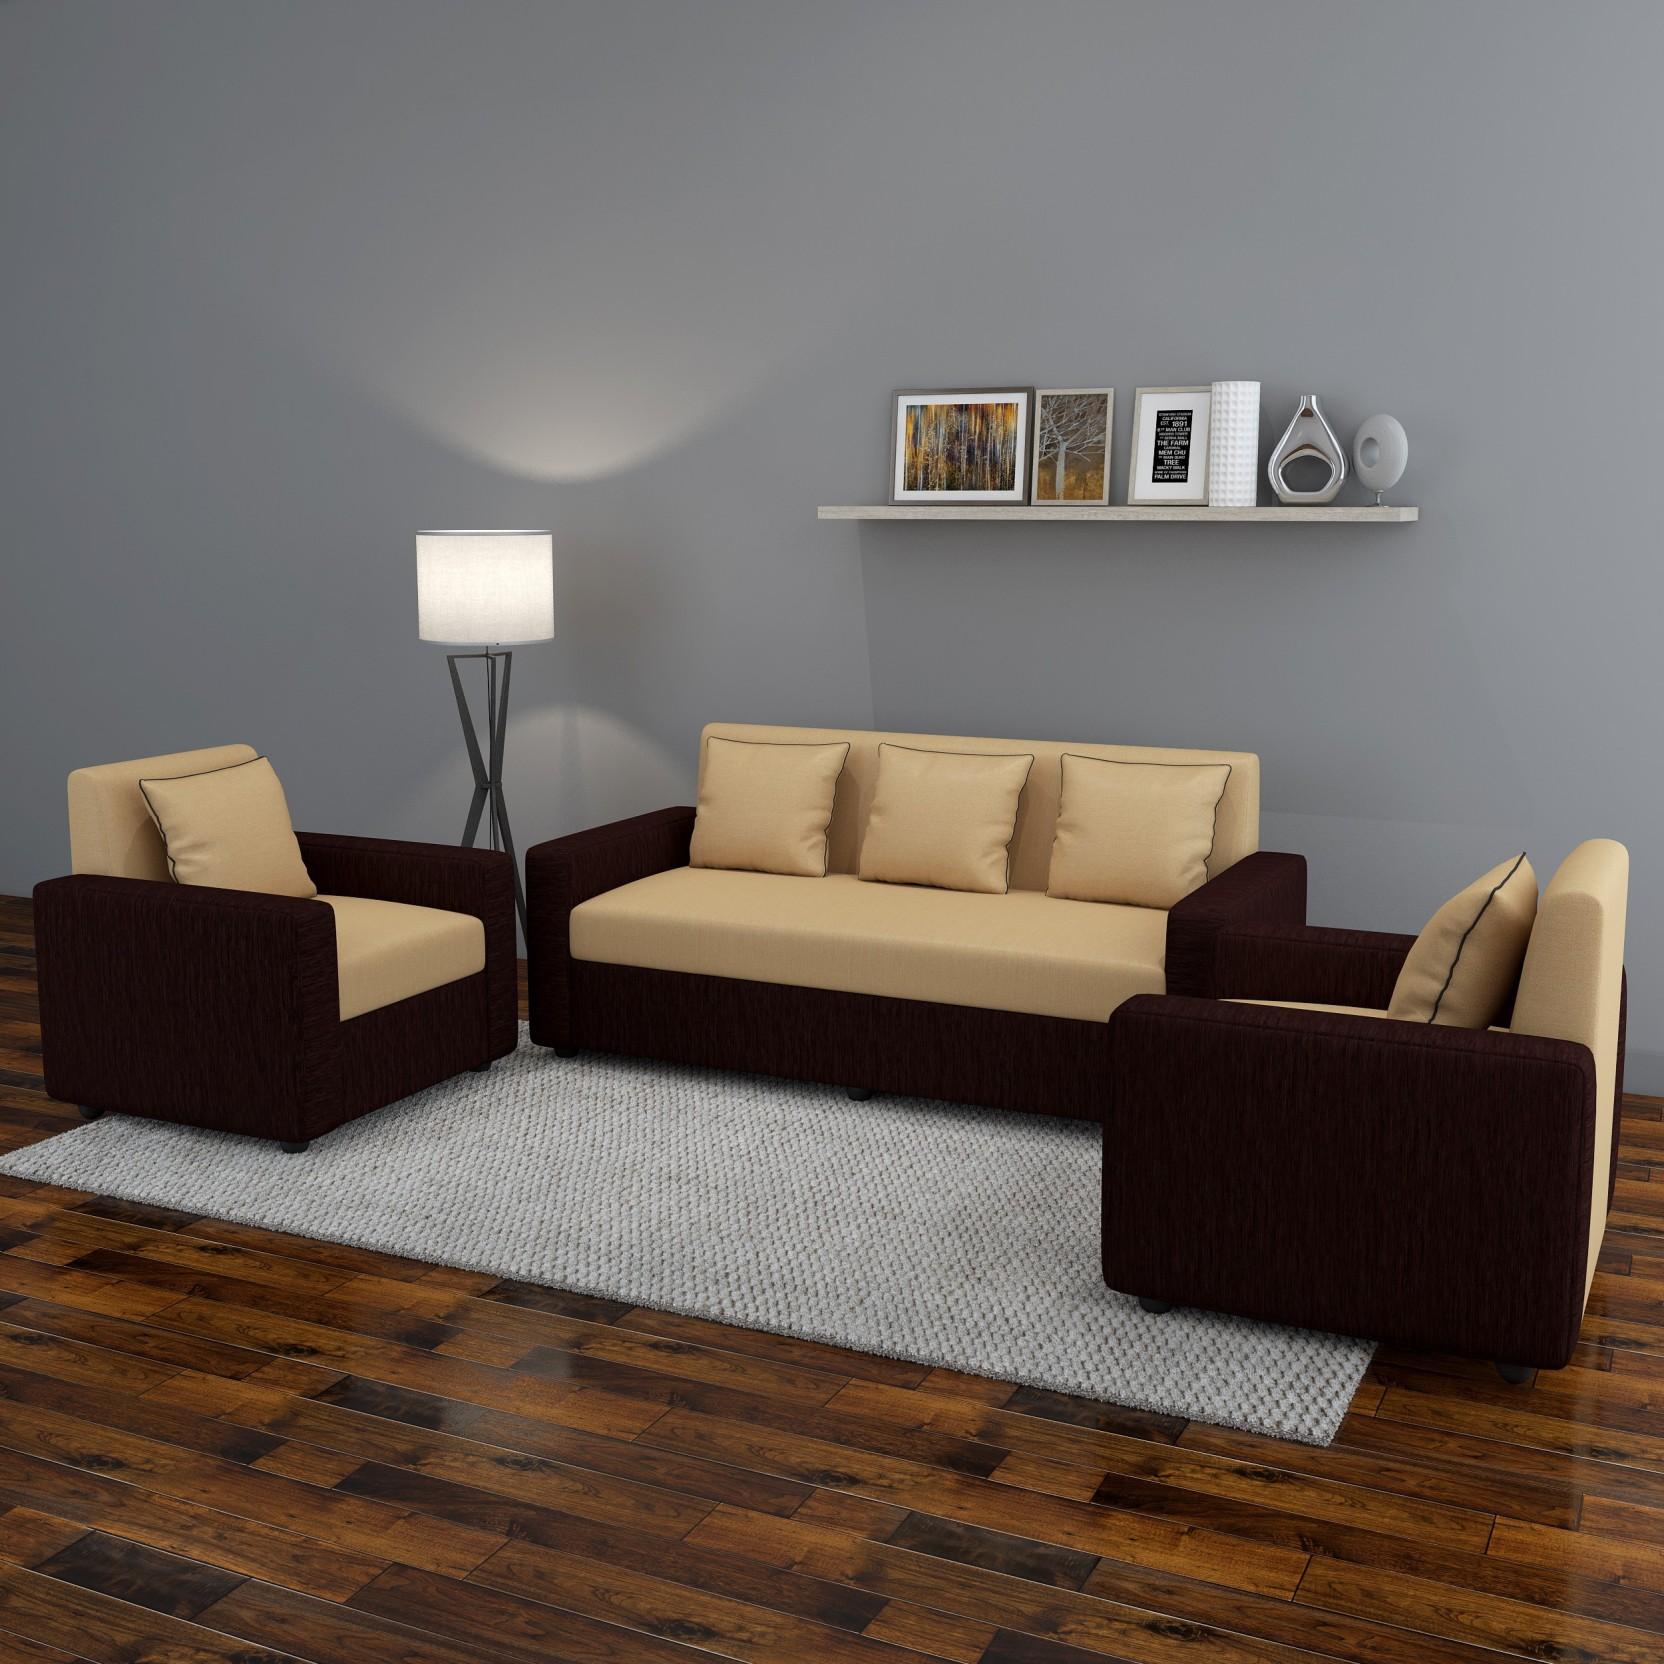 Settee Sofa Furniture Prices In India: Gioteak Fabric 3 + 1 + 1 CREAM BROWN Sofa Set Price In